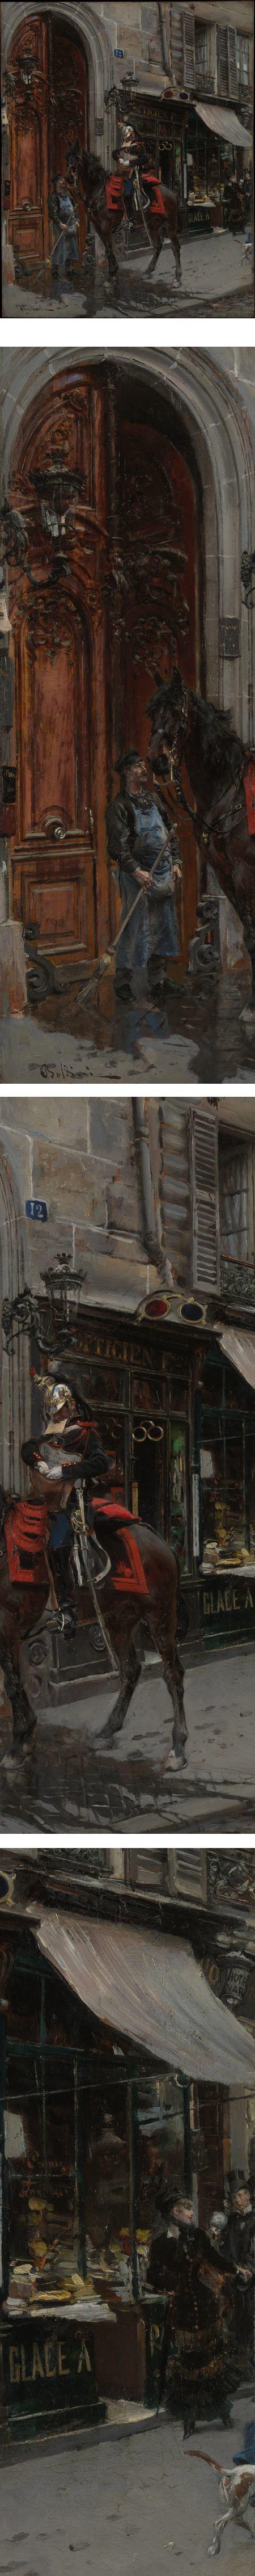 The Dispatch-Bearer, Giovanni Boldini